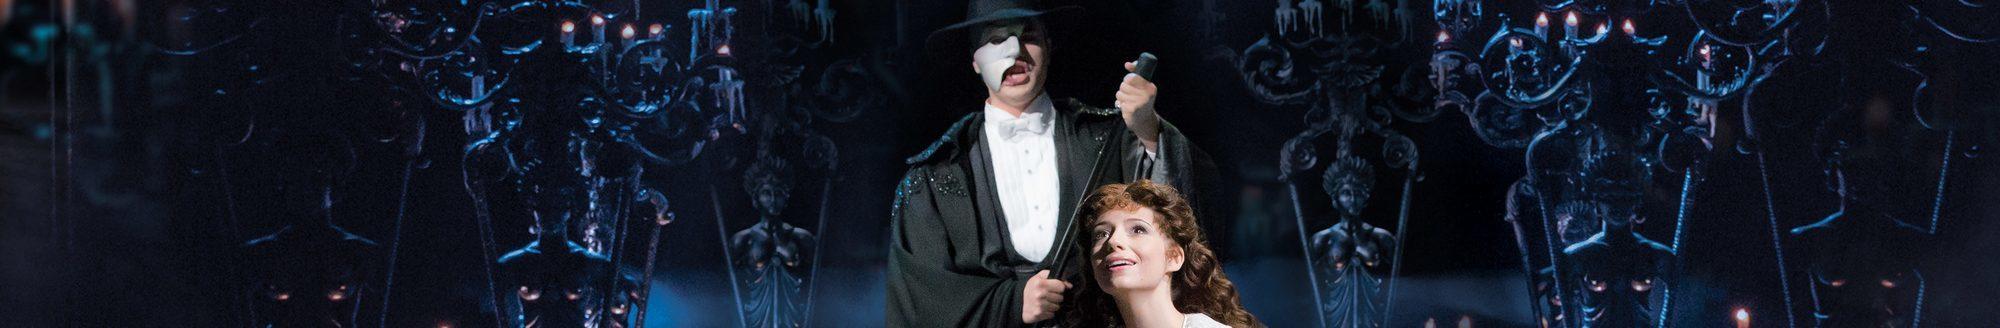 The Phantom of the Opera : The Musical